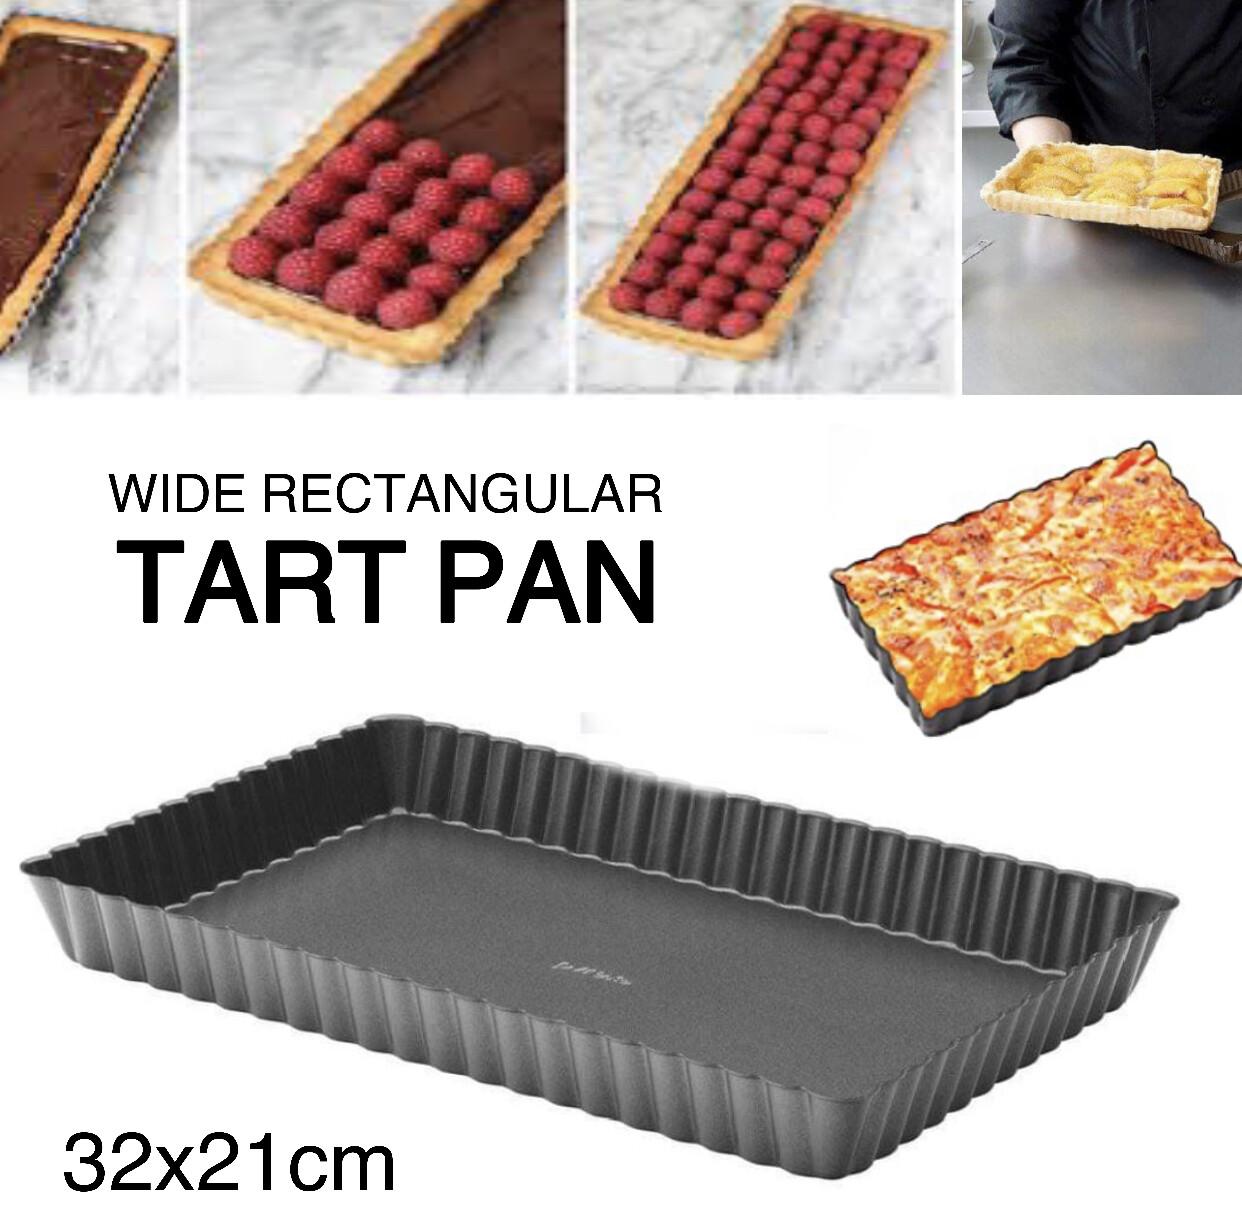 Rectangular Tart Pan 32cm